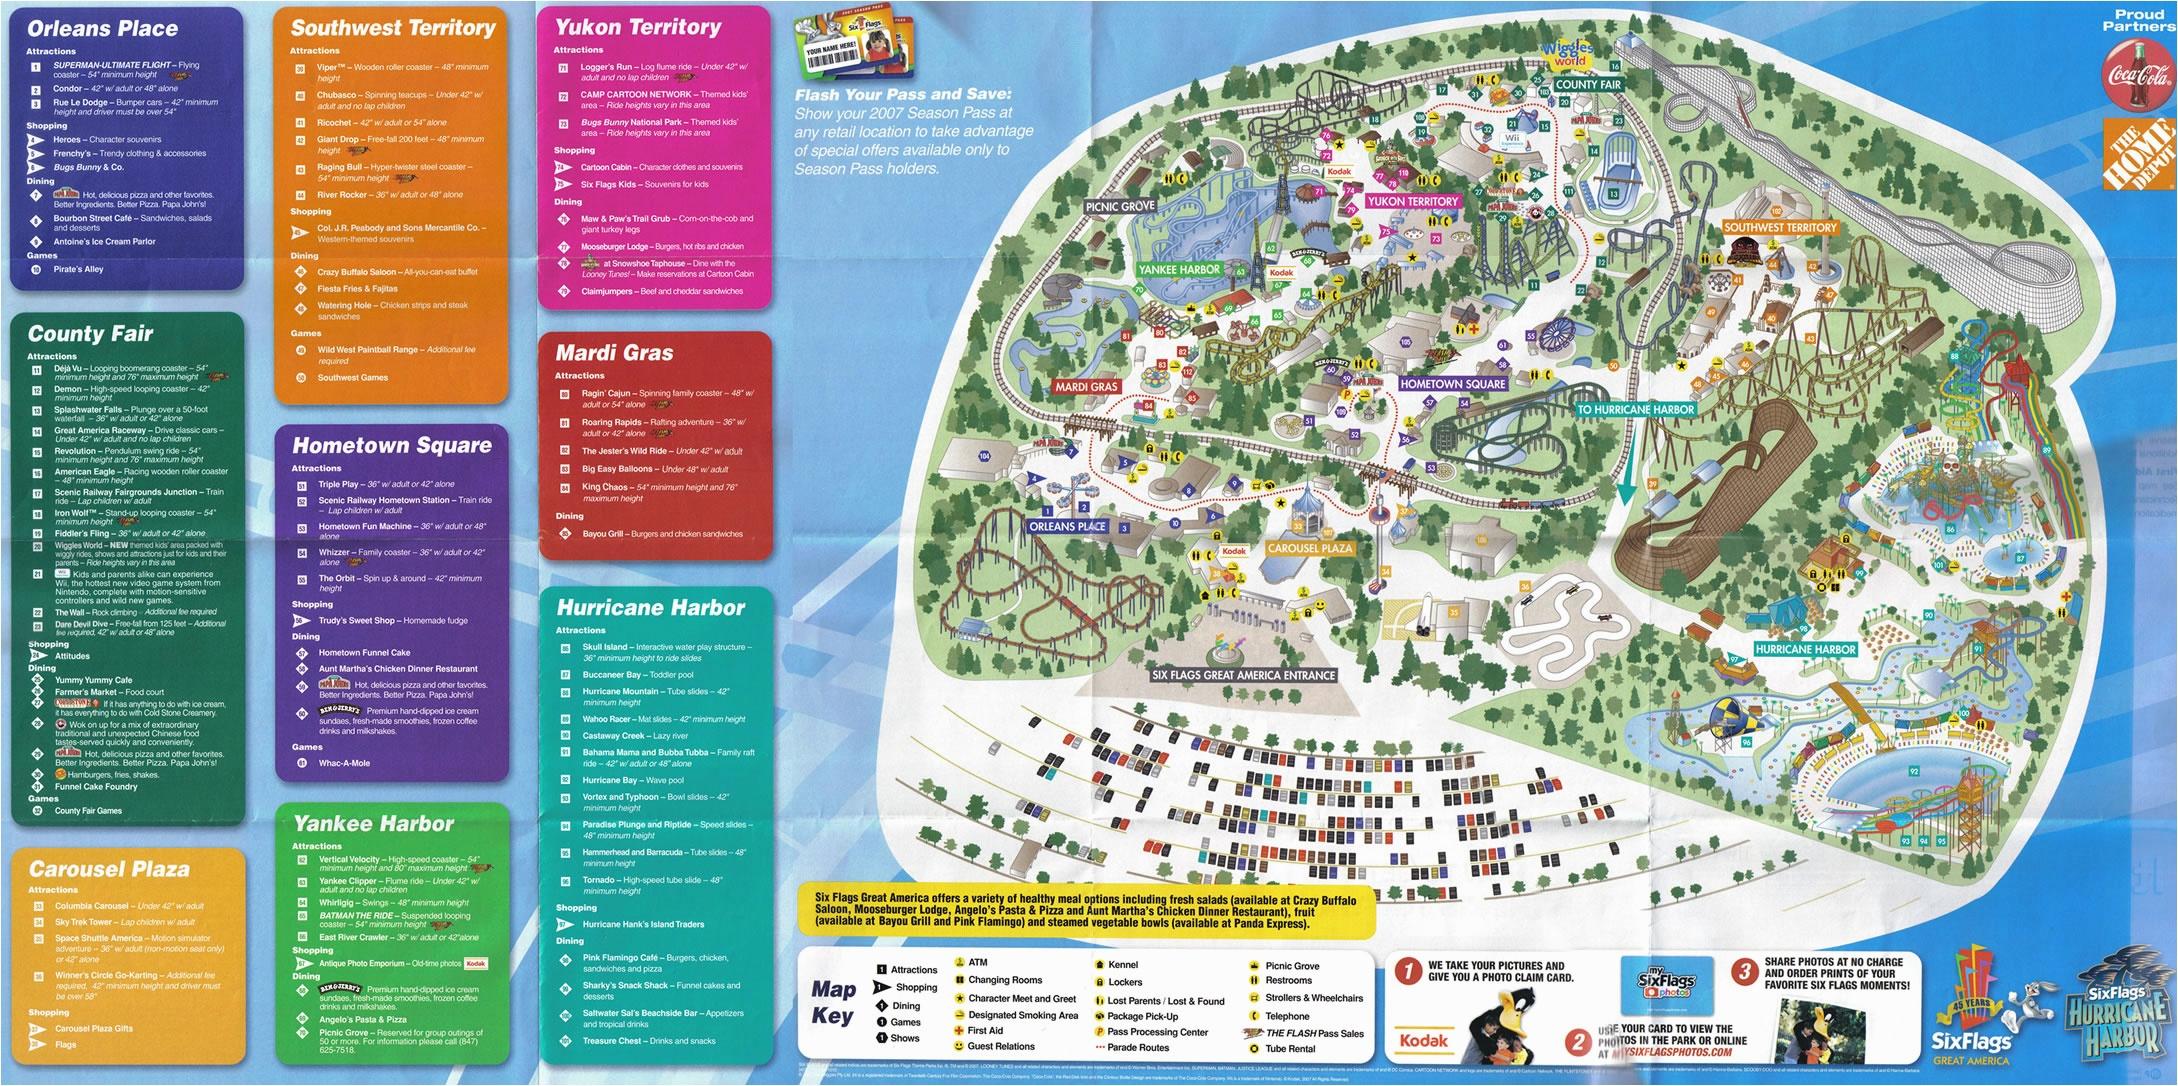 Six Flags Great America Map Burkeen Great America San Jose Map - Six Flags Map California 2018